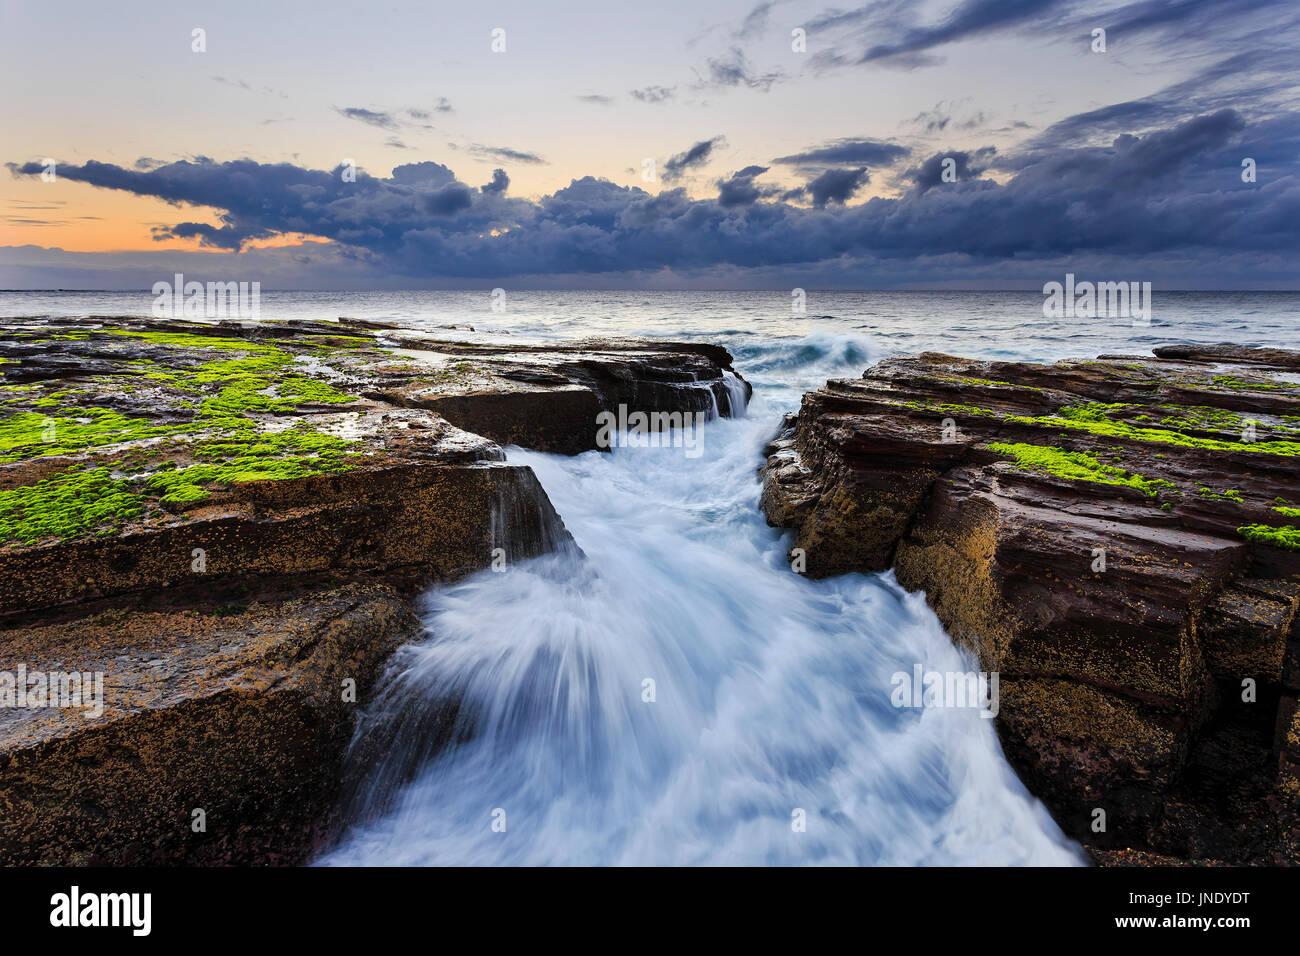 Crack in coastal rocks of Pacific ocean when inbound wave flows through between sandstone boulders at sunrise. - Stock Image